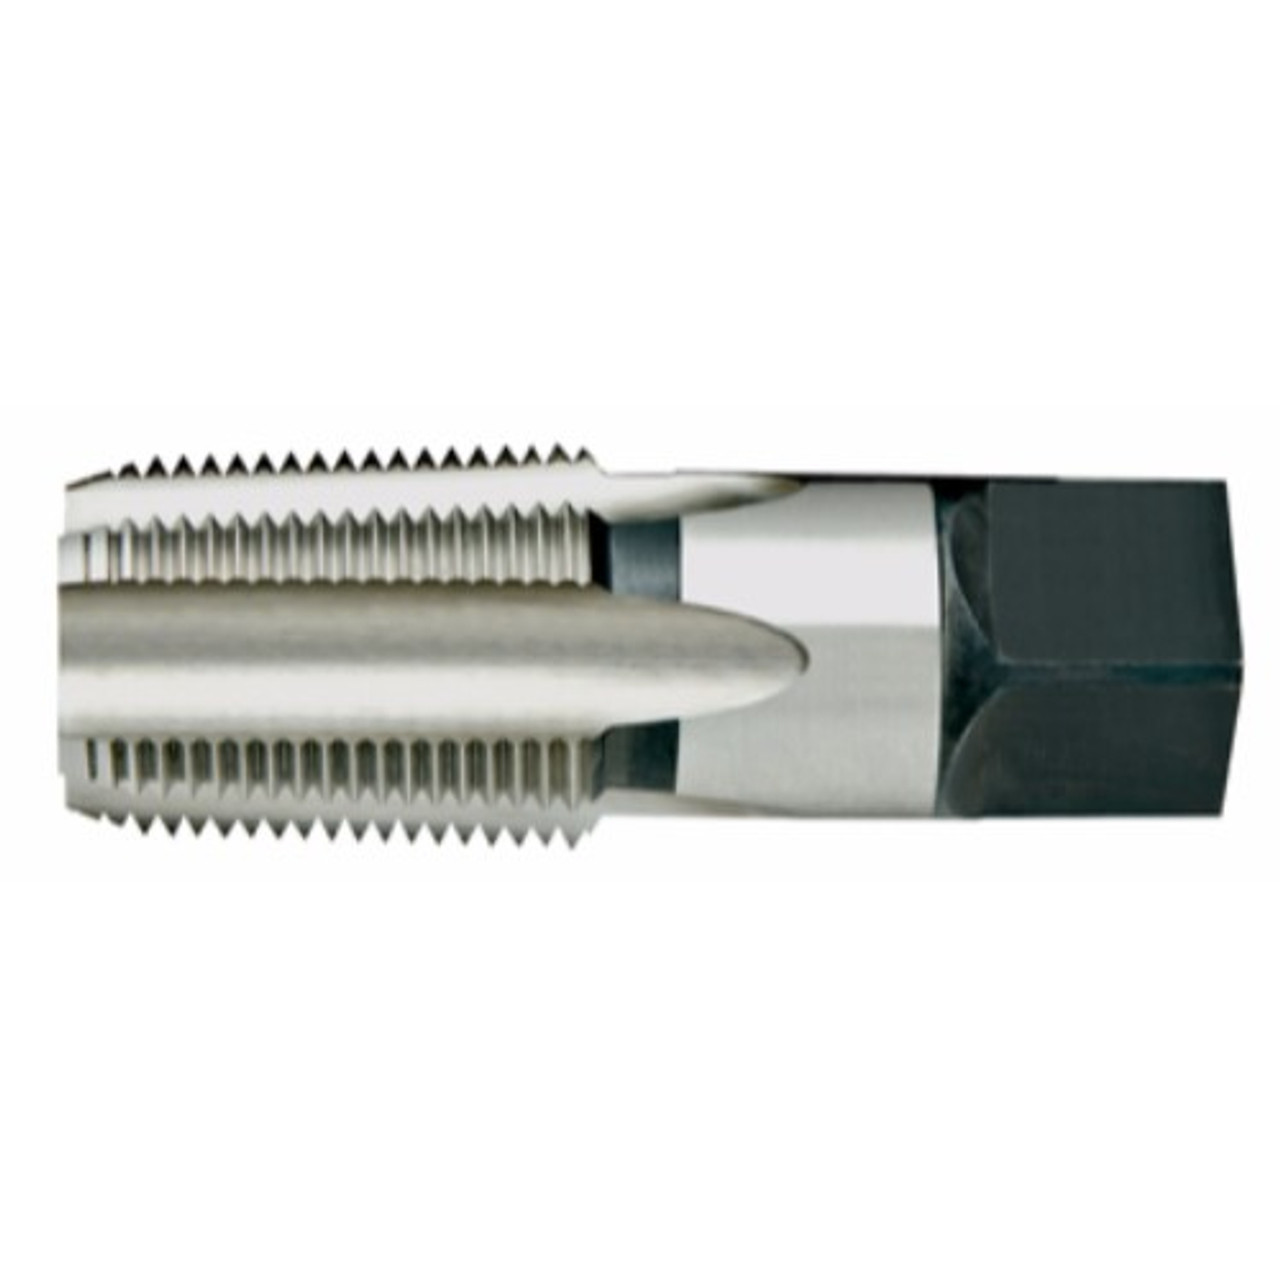 New HSS 1//16-27 NPT Taper Pipe Thread Home Improvement Hand Tools